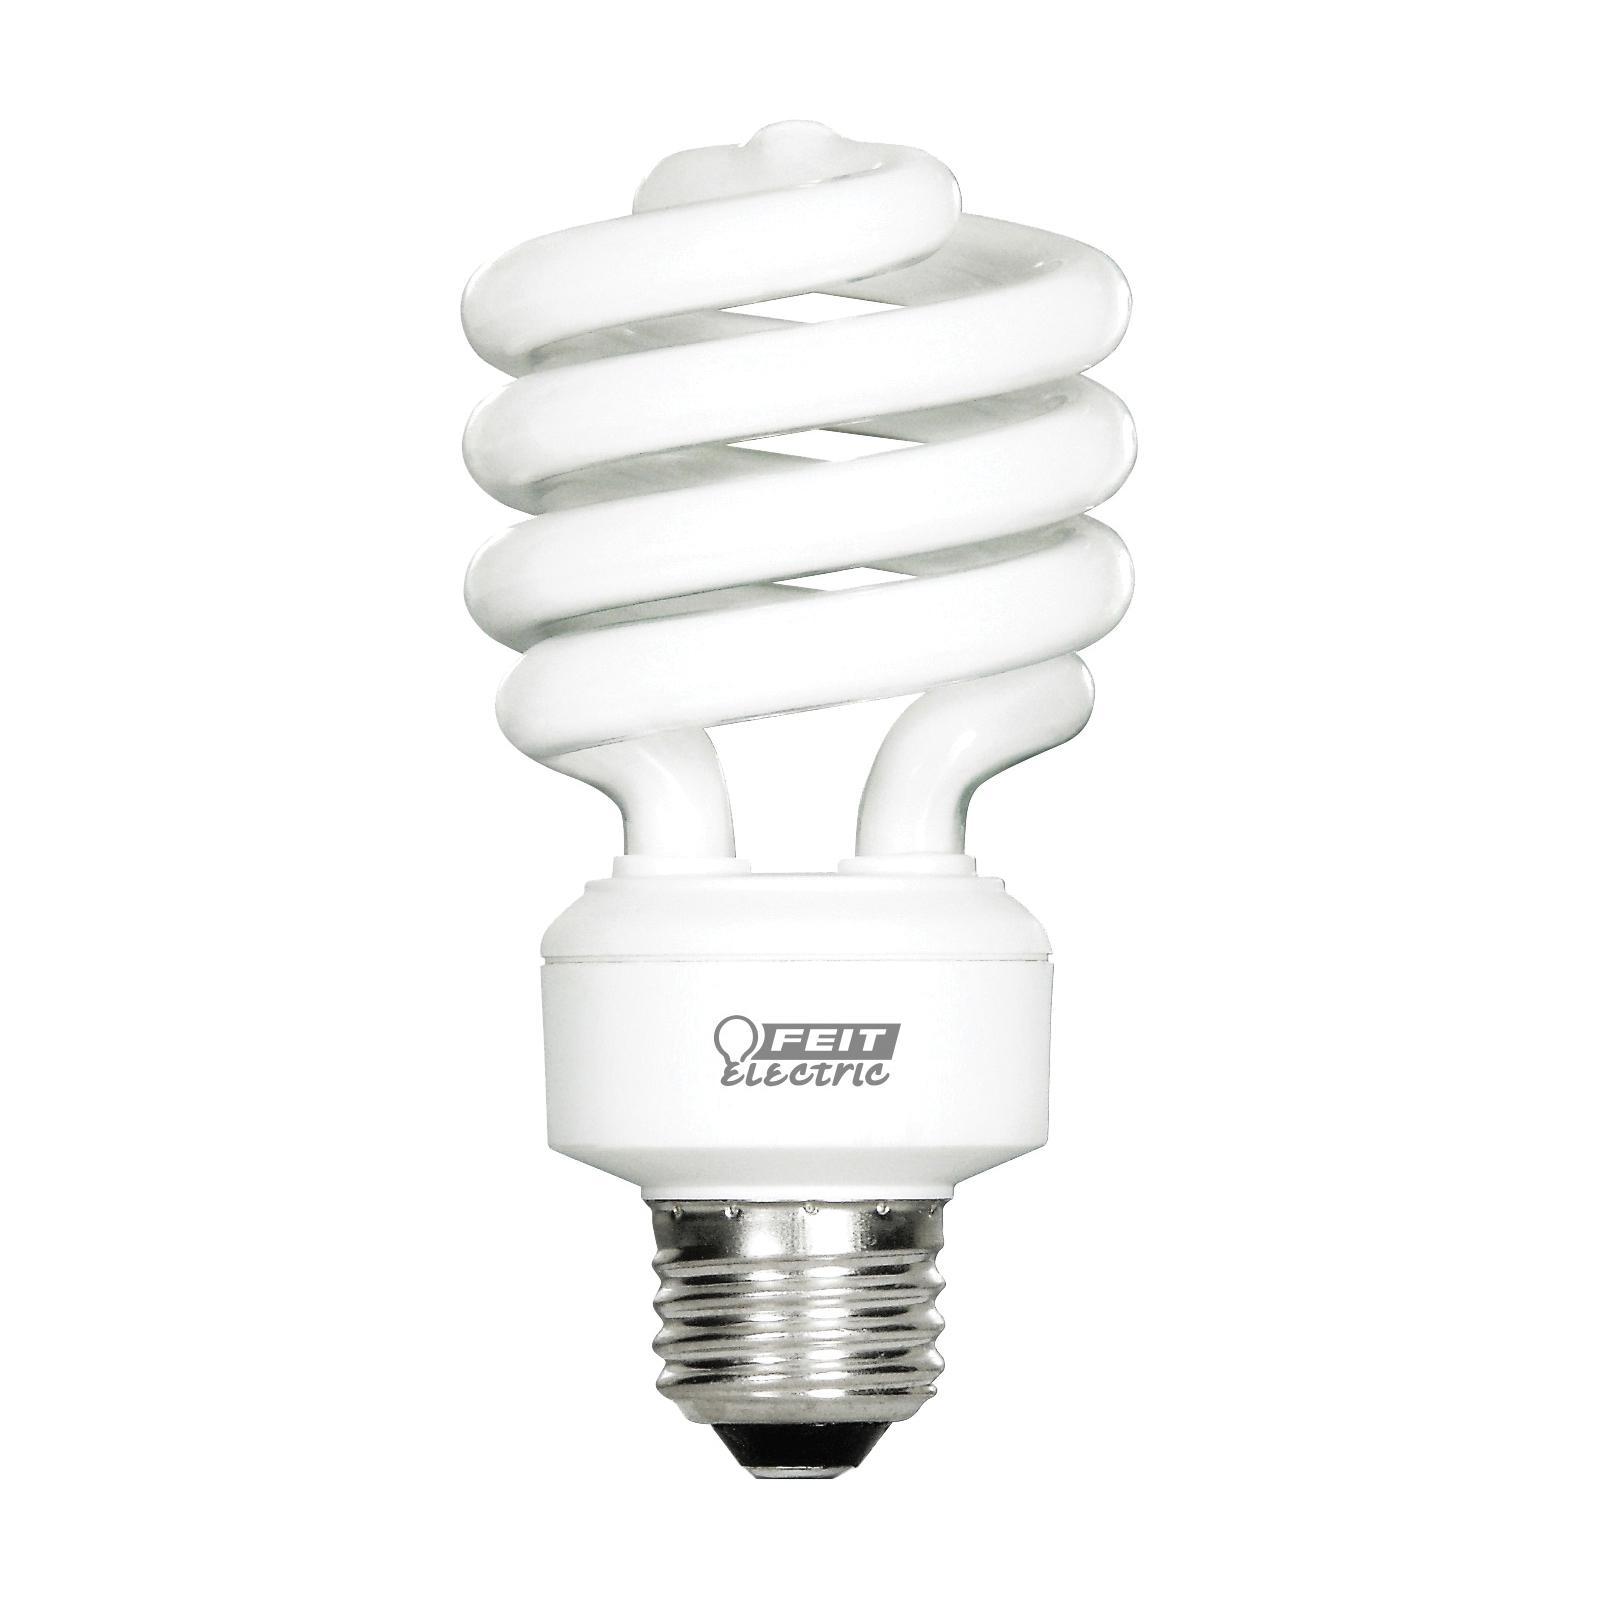 Picture of Feit Electric ESL23TM/D/4 Compact Fluorescent Bulb, 23 W, Spiral Lamp, Medium E26 Lamp Base, 1600 Lumens